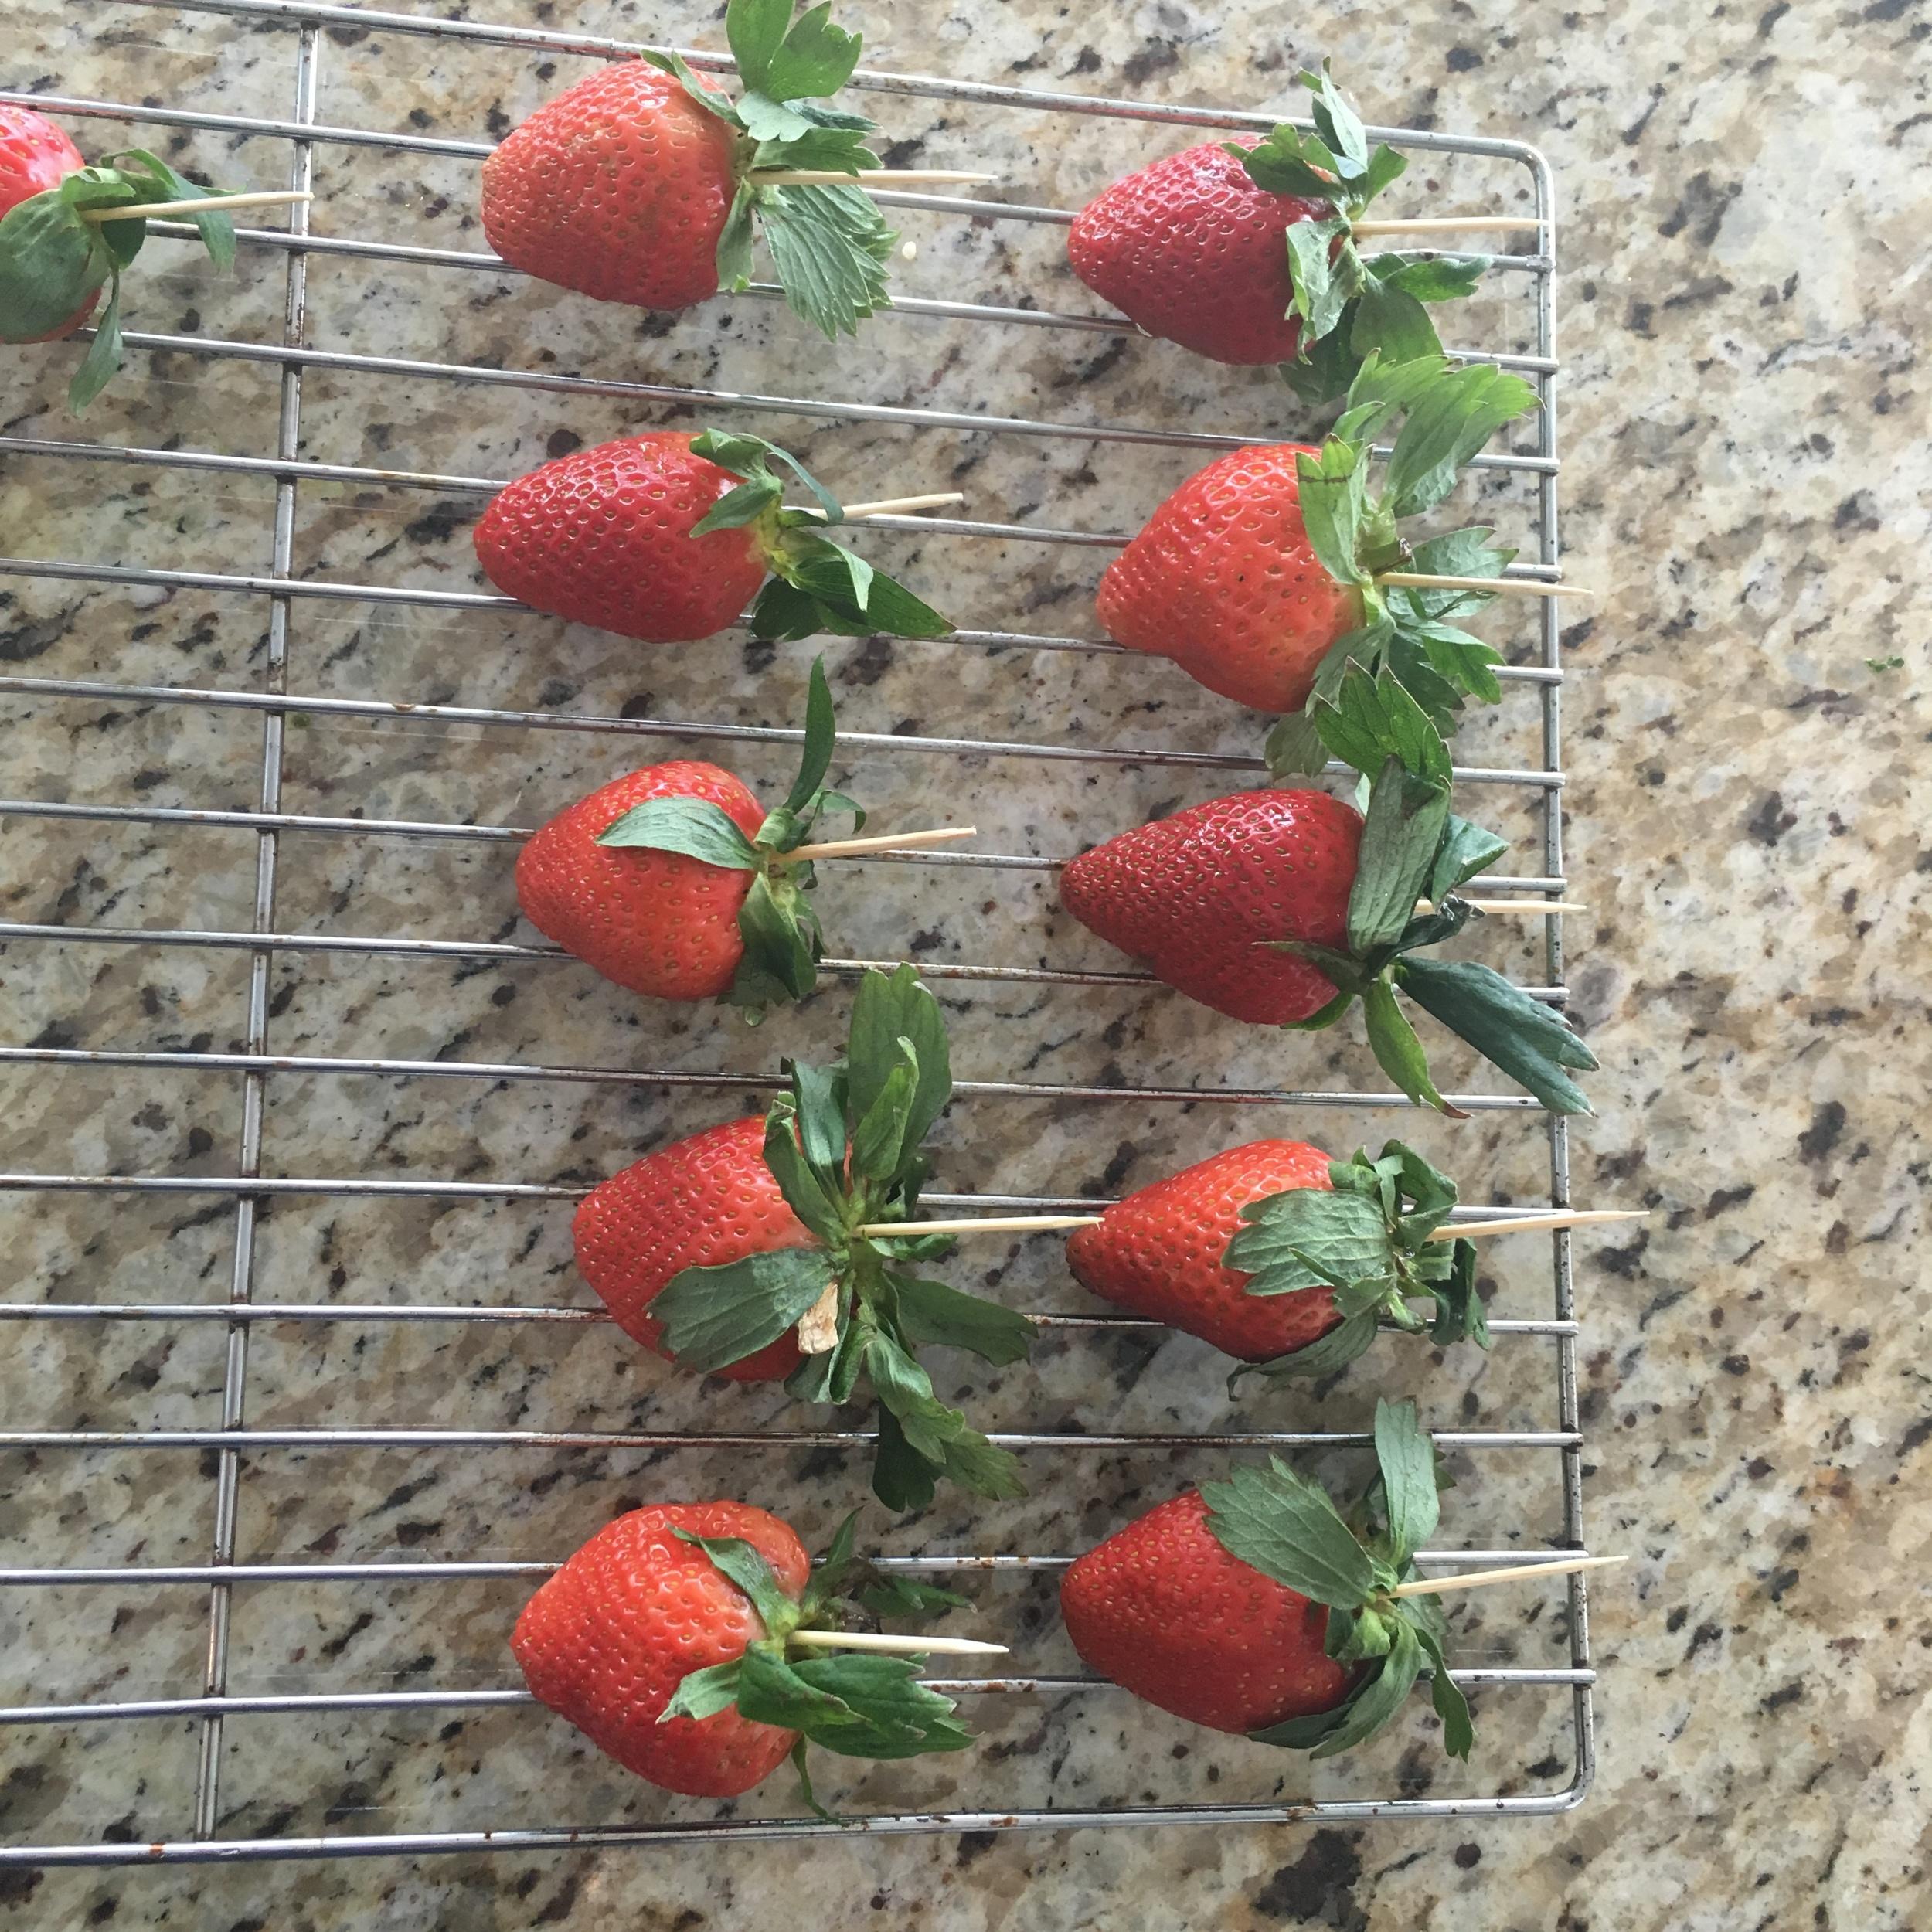 Food - Chocolate Covered Strawberries1.JPG